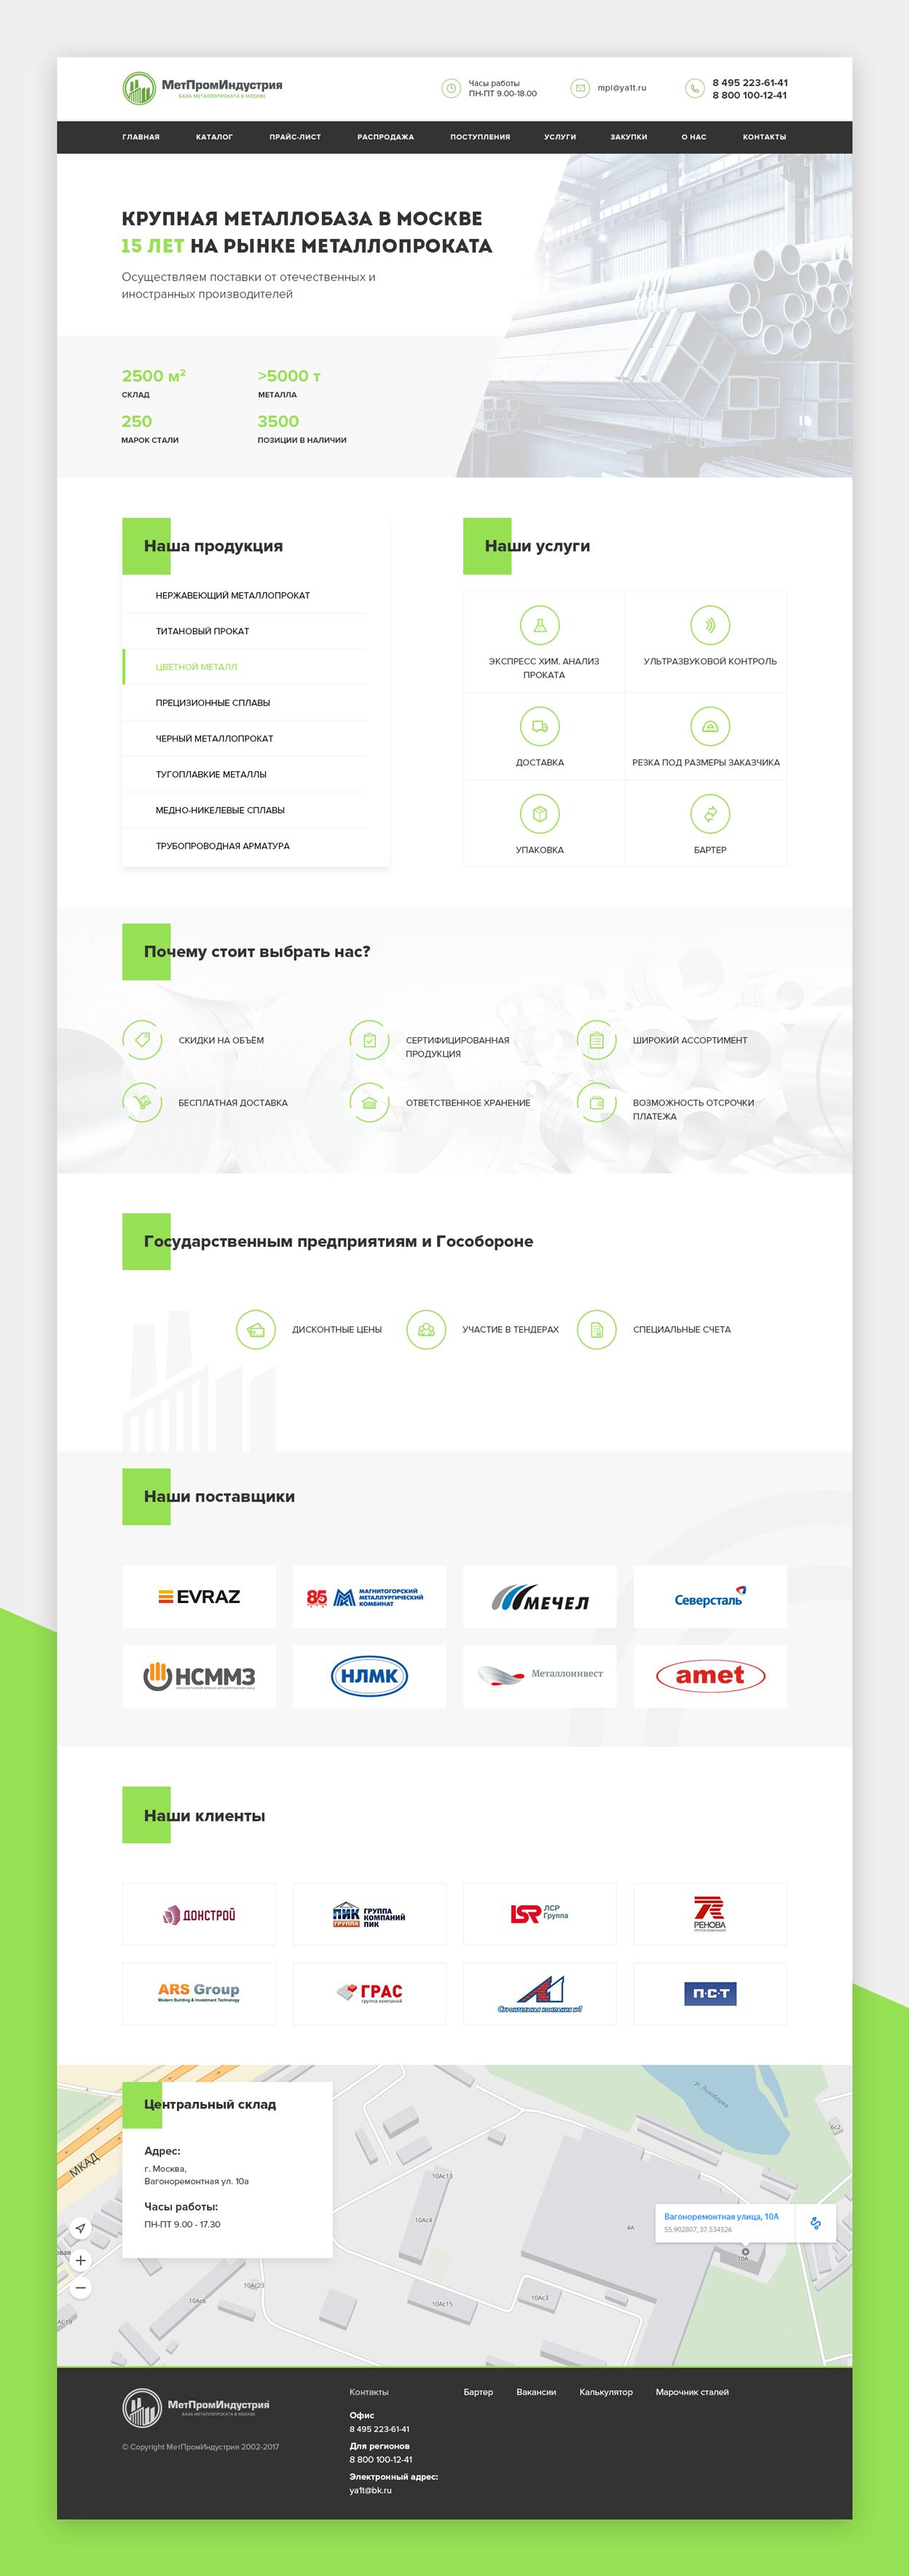 Дизайн сайта для металлоторгующей компании фото f_90759931e6b81bb7.png